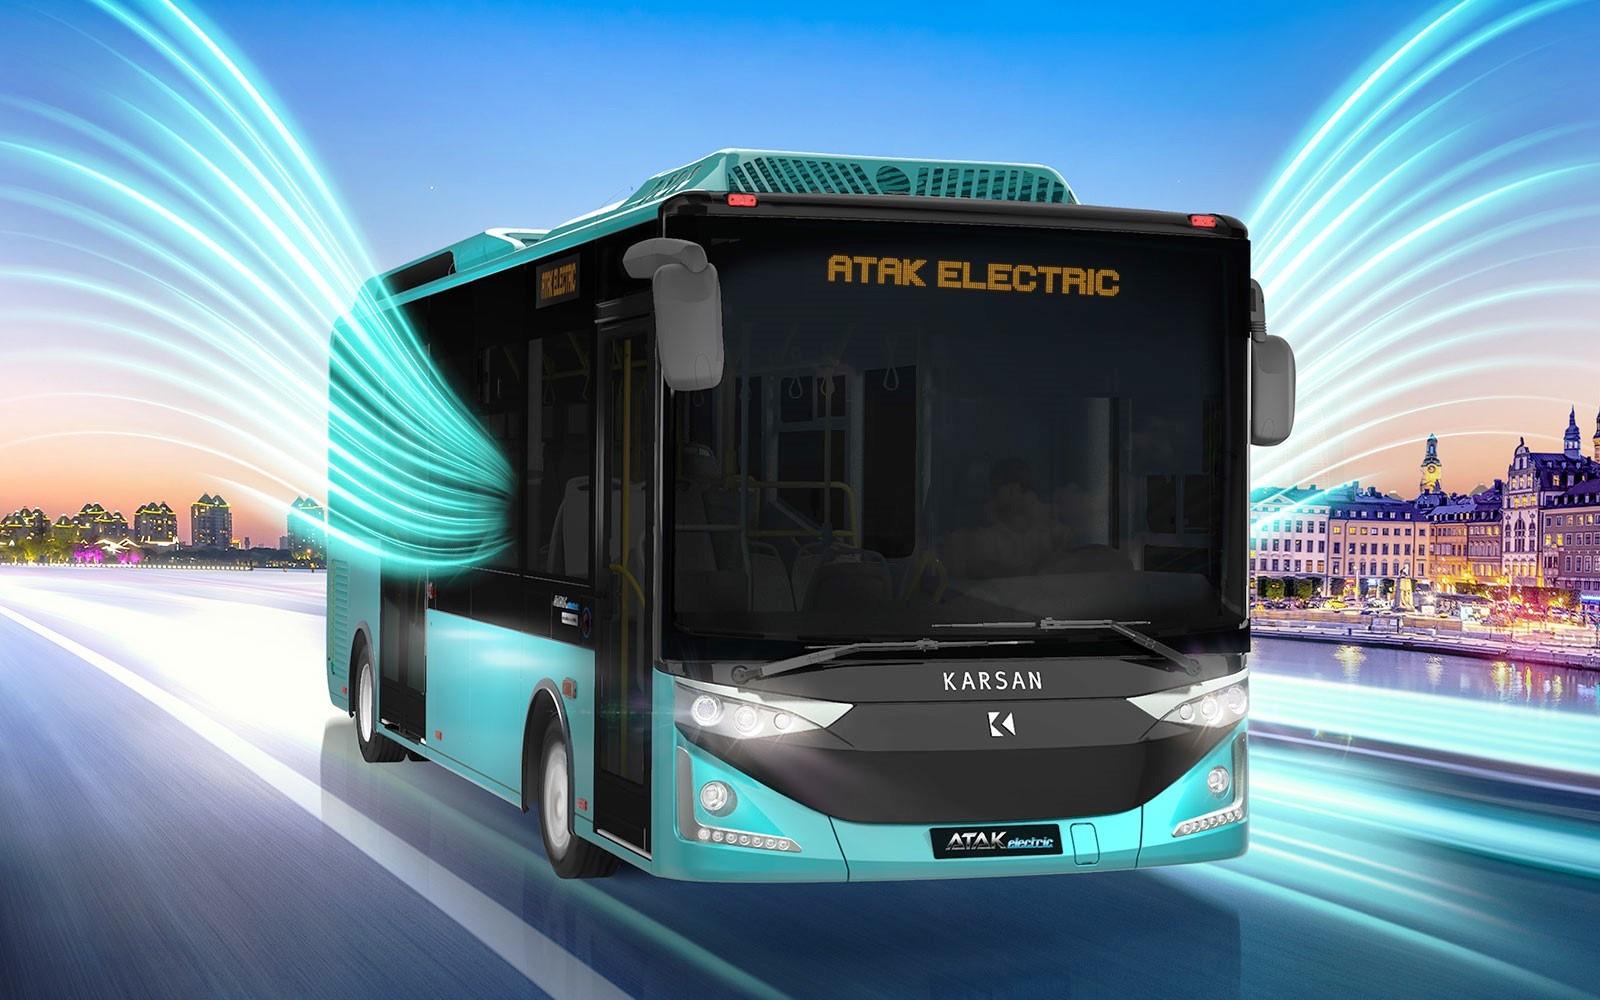 Karsan-Autonom-fahrender-Elektrobus-aus-der-T-rkei